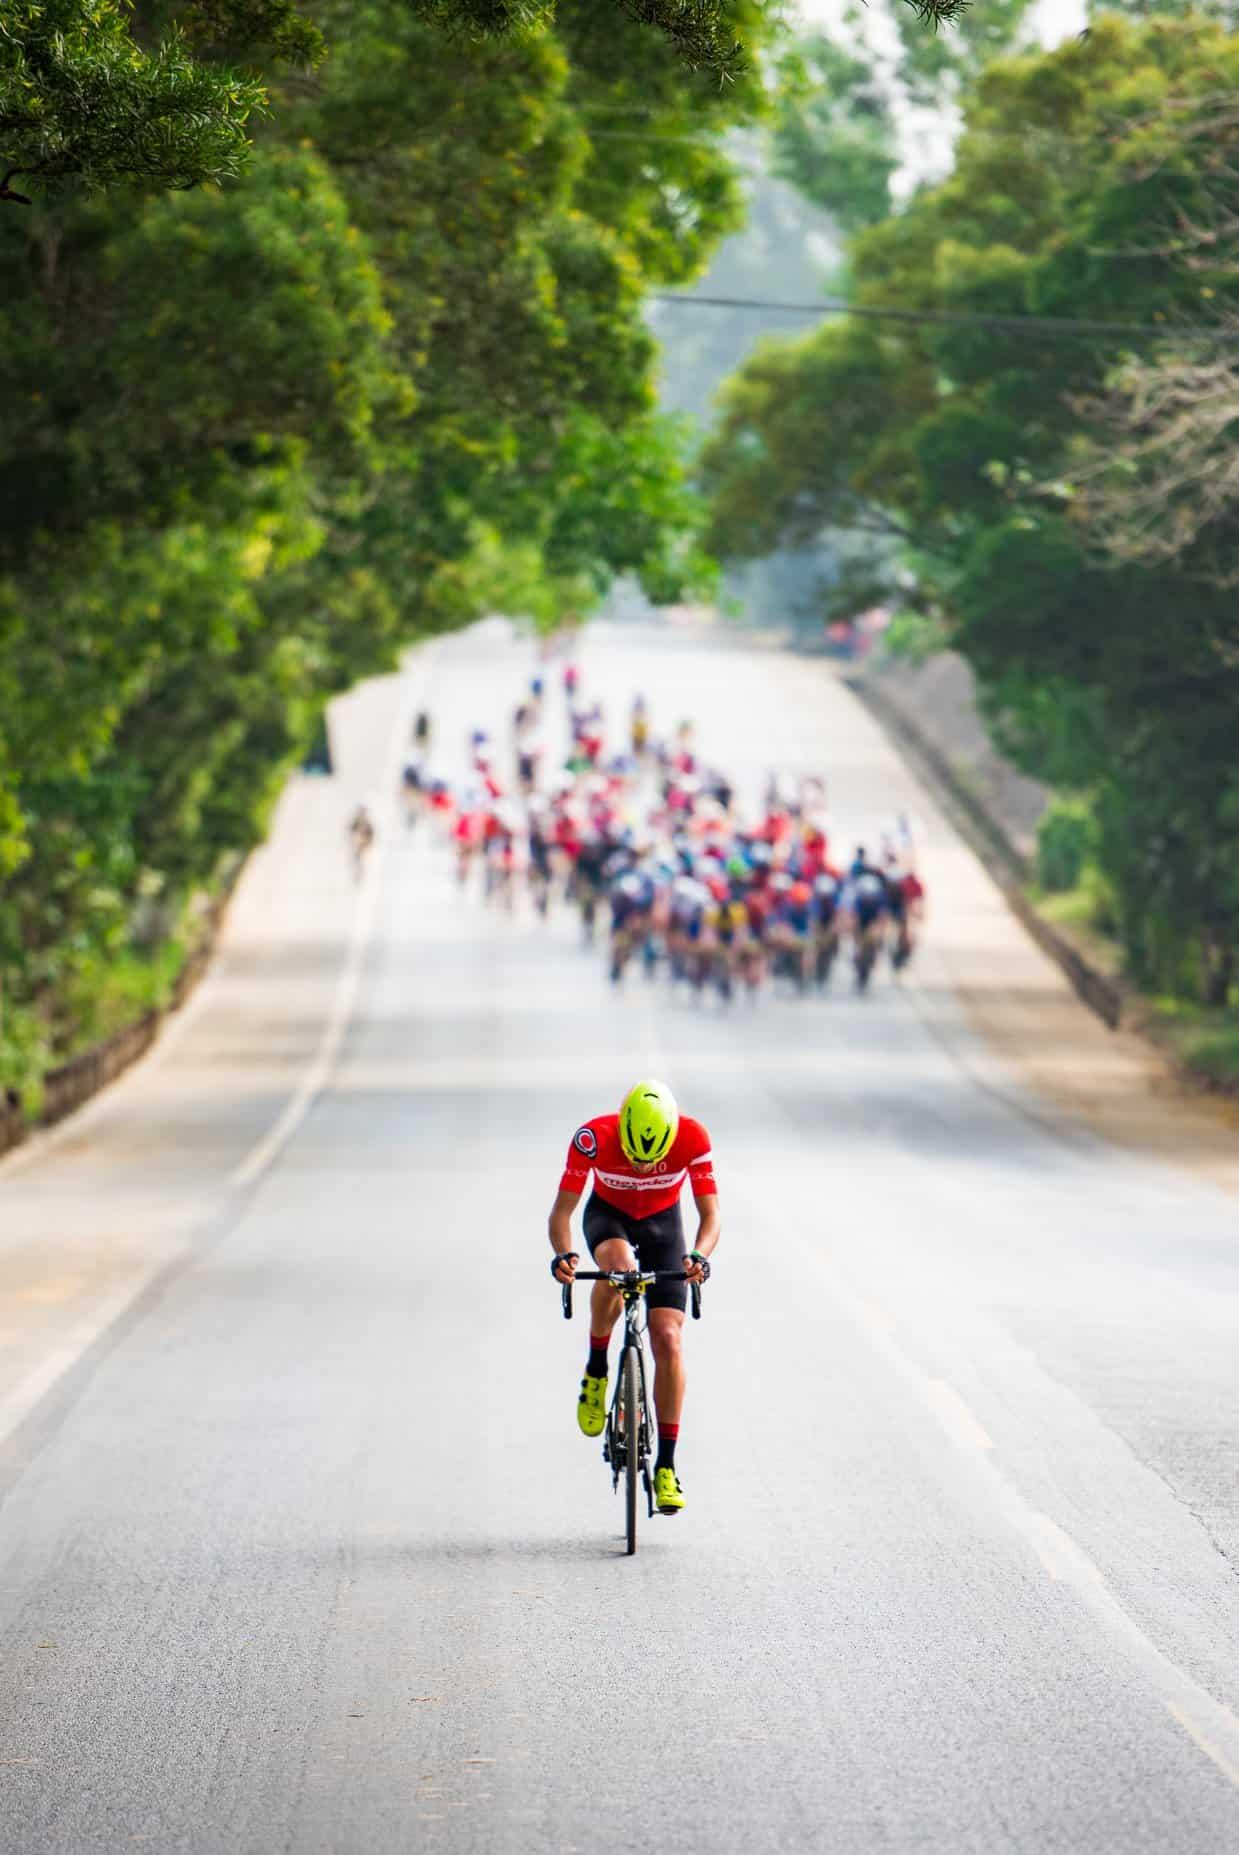 photo de nicolas raybaud sur la route de Ruili au Granfondo Yunnan prise par le photographe Kirk Kenny